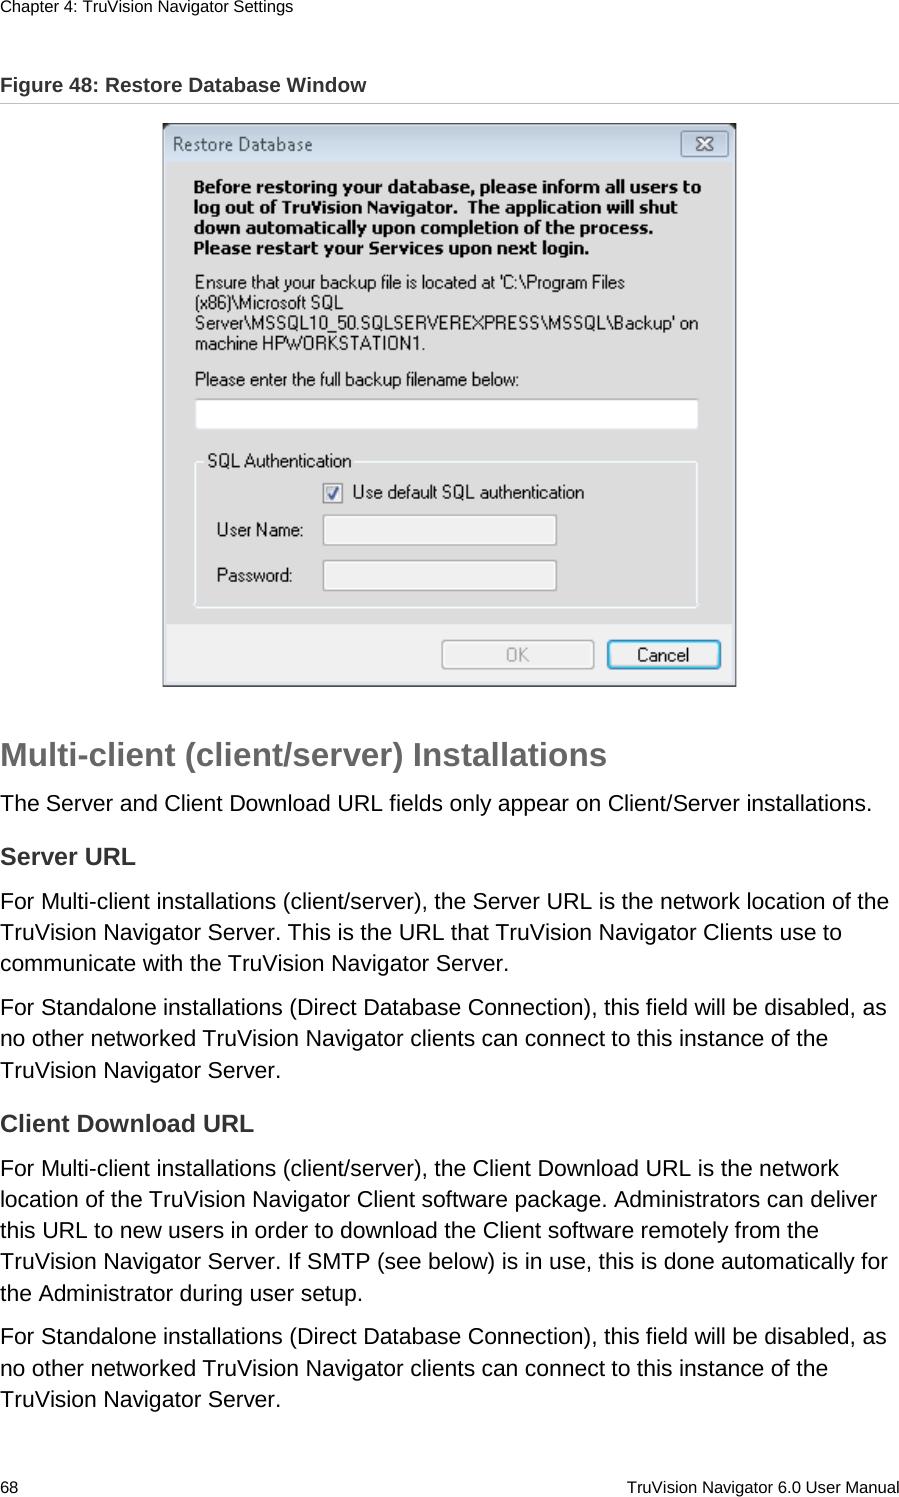 InterLogix 1064107 J Truvision Navigator 6 0 User Manual En 6 0